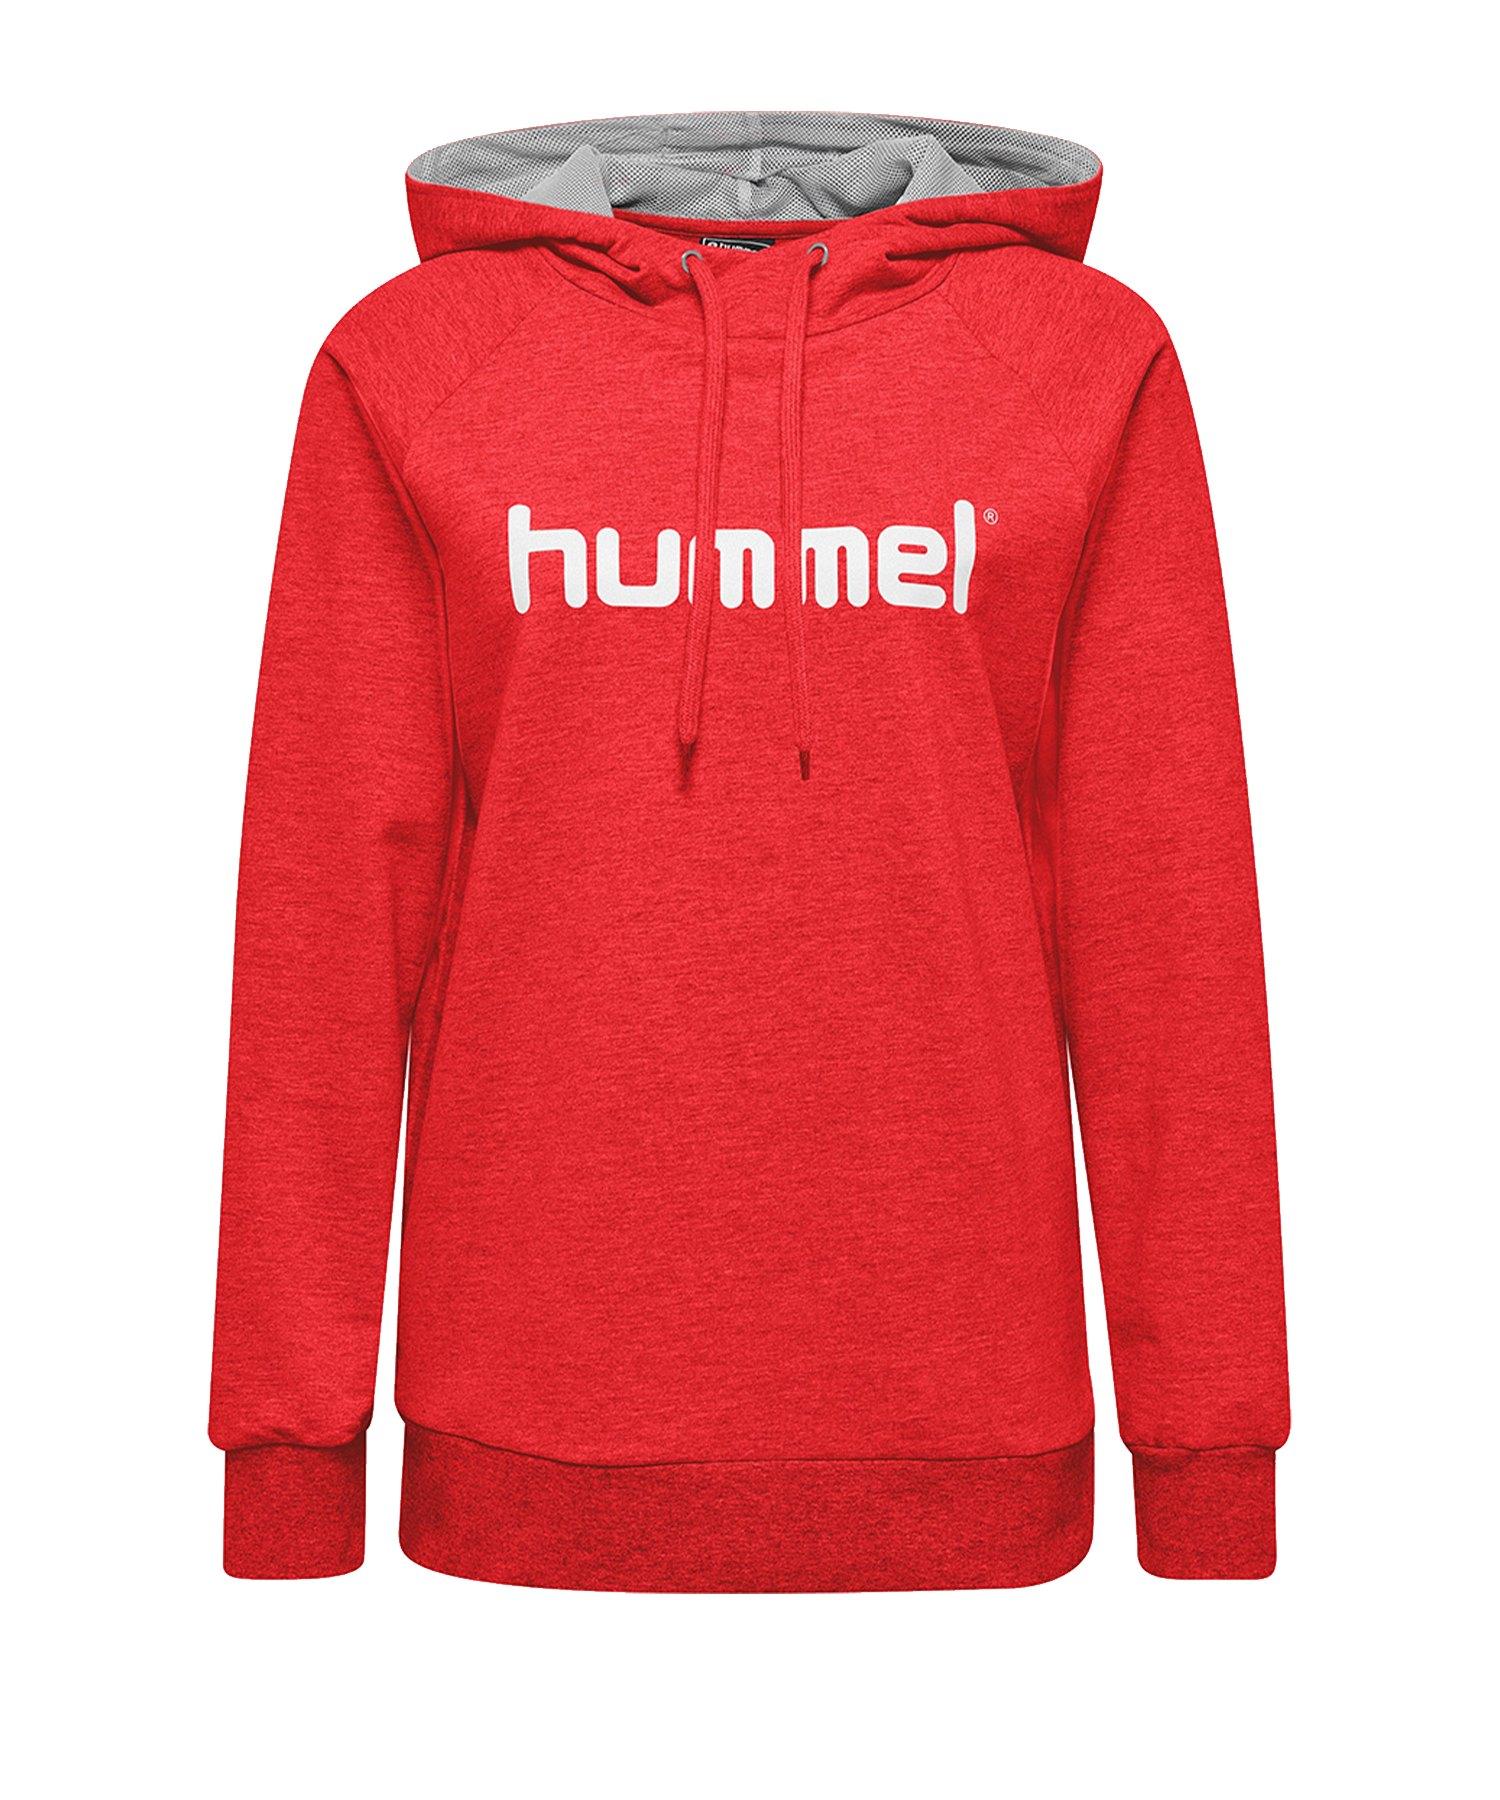 Hummel Cotton Logo Hoody Damen Rot F3062 - Rot